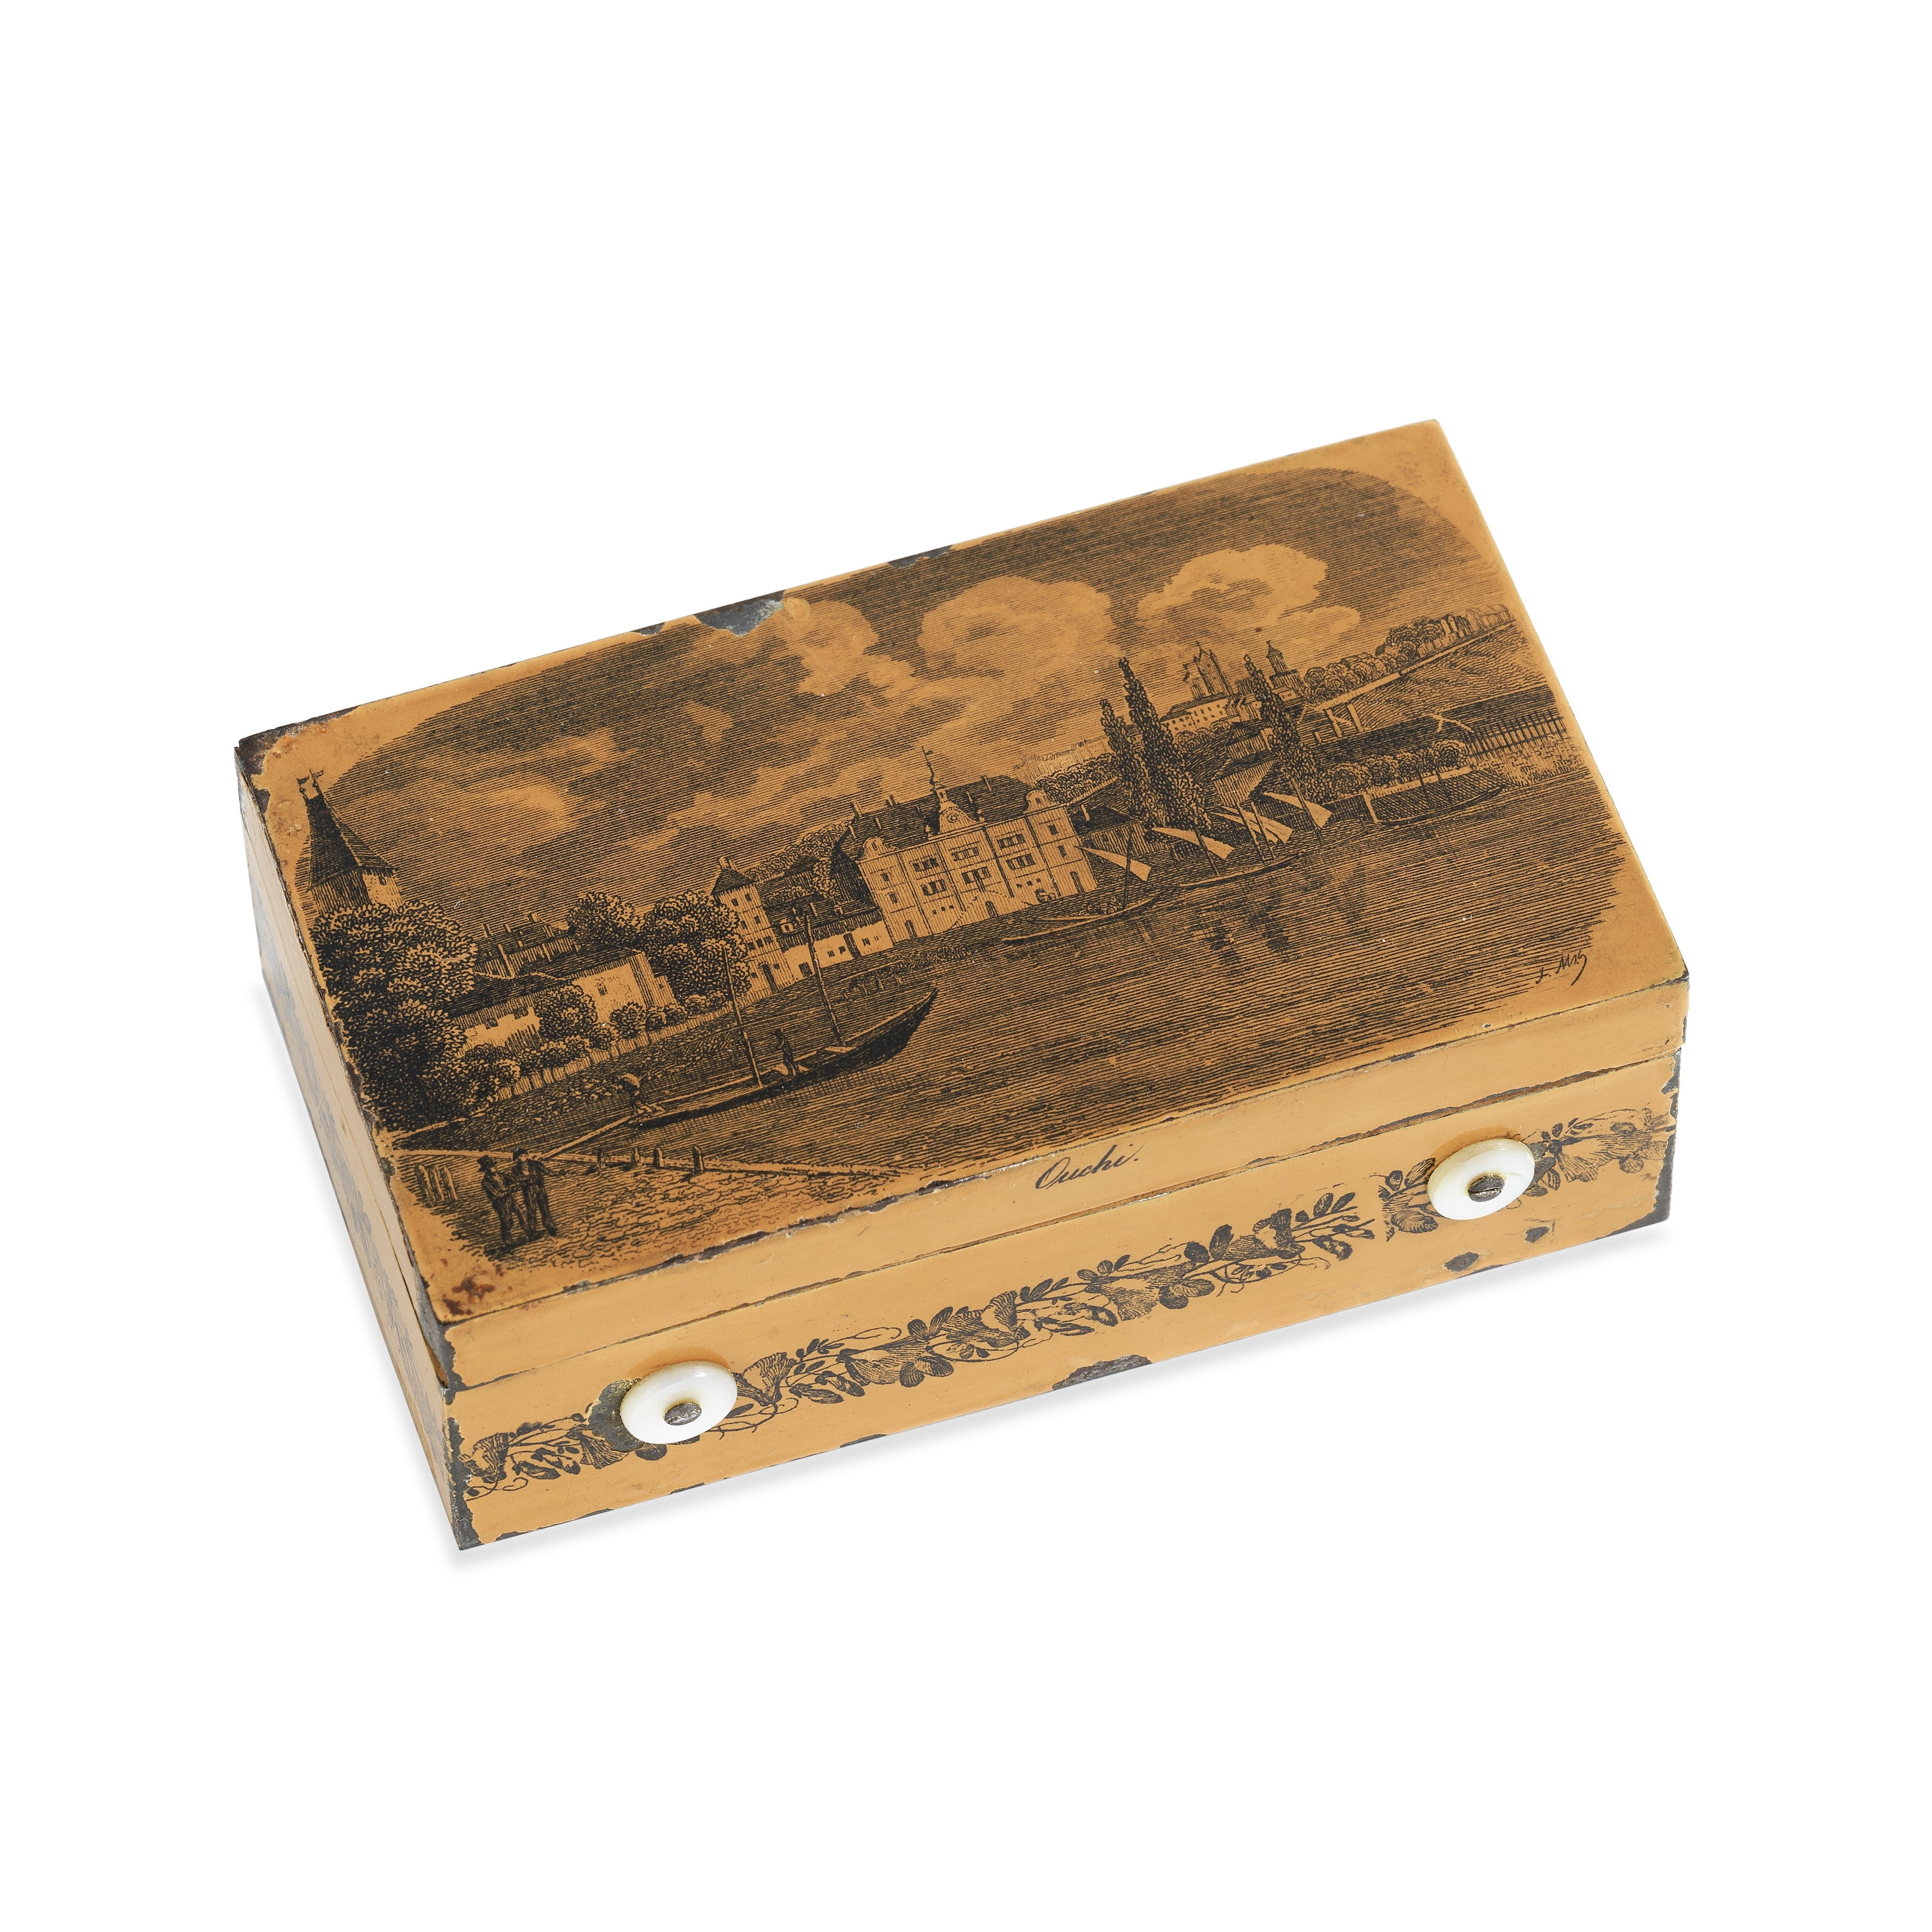 A Small Cylinder Musical Box, Swiss, circa 1840,